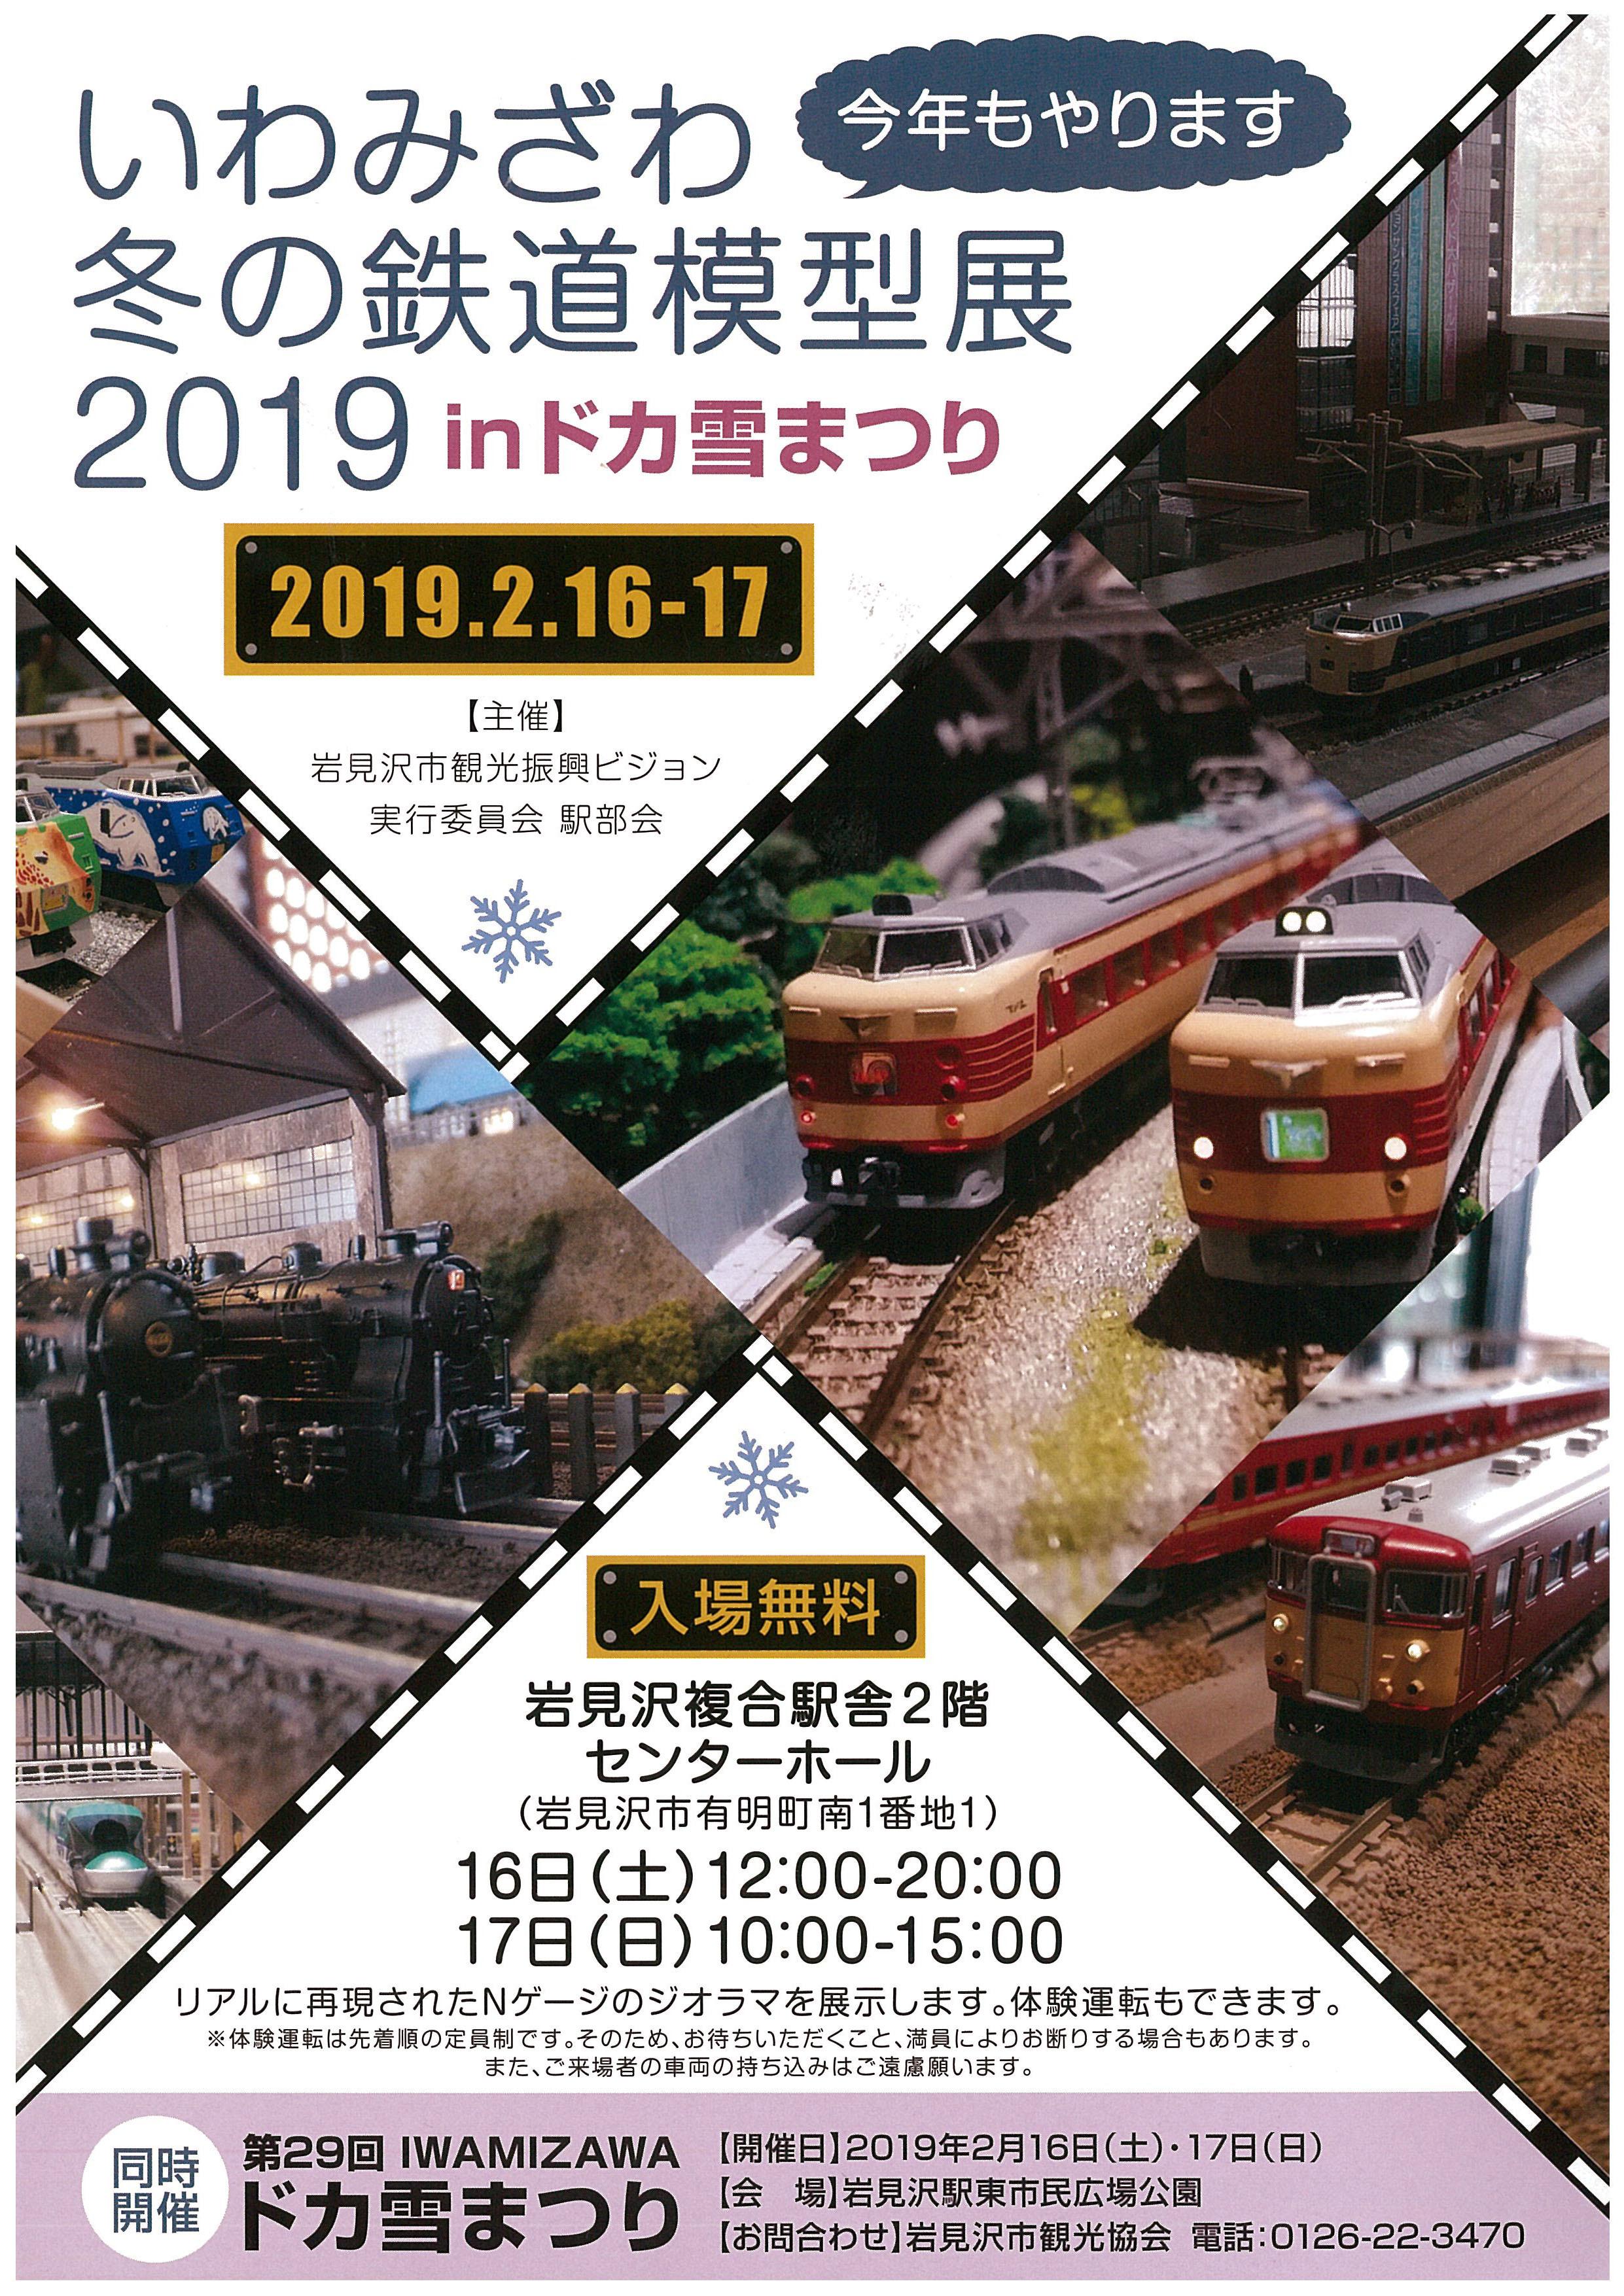 冬の鉄道模型展